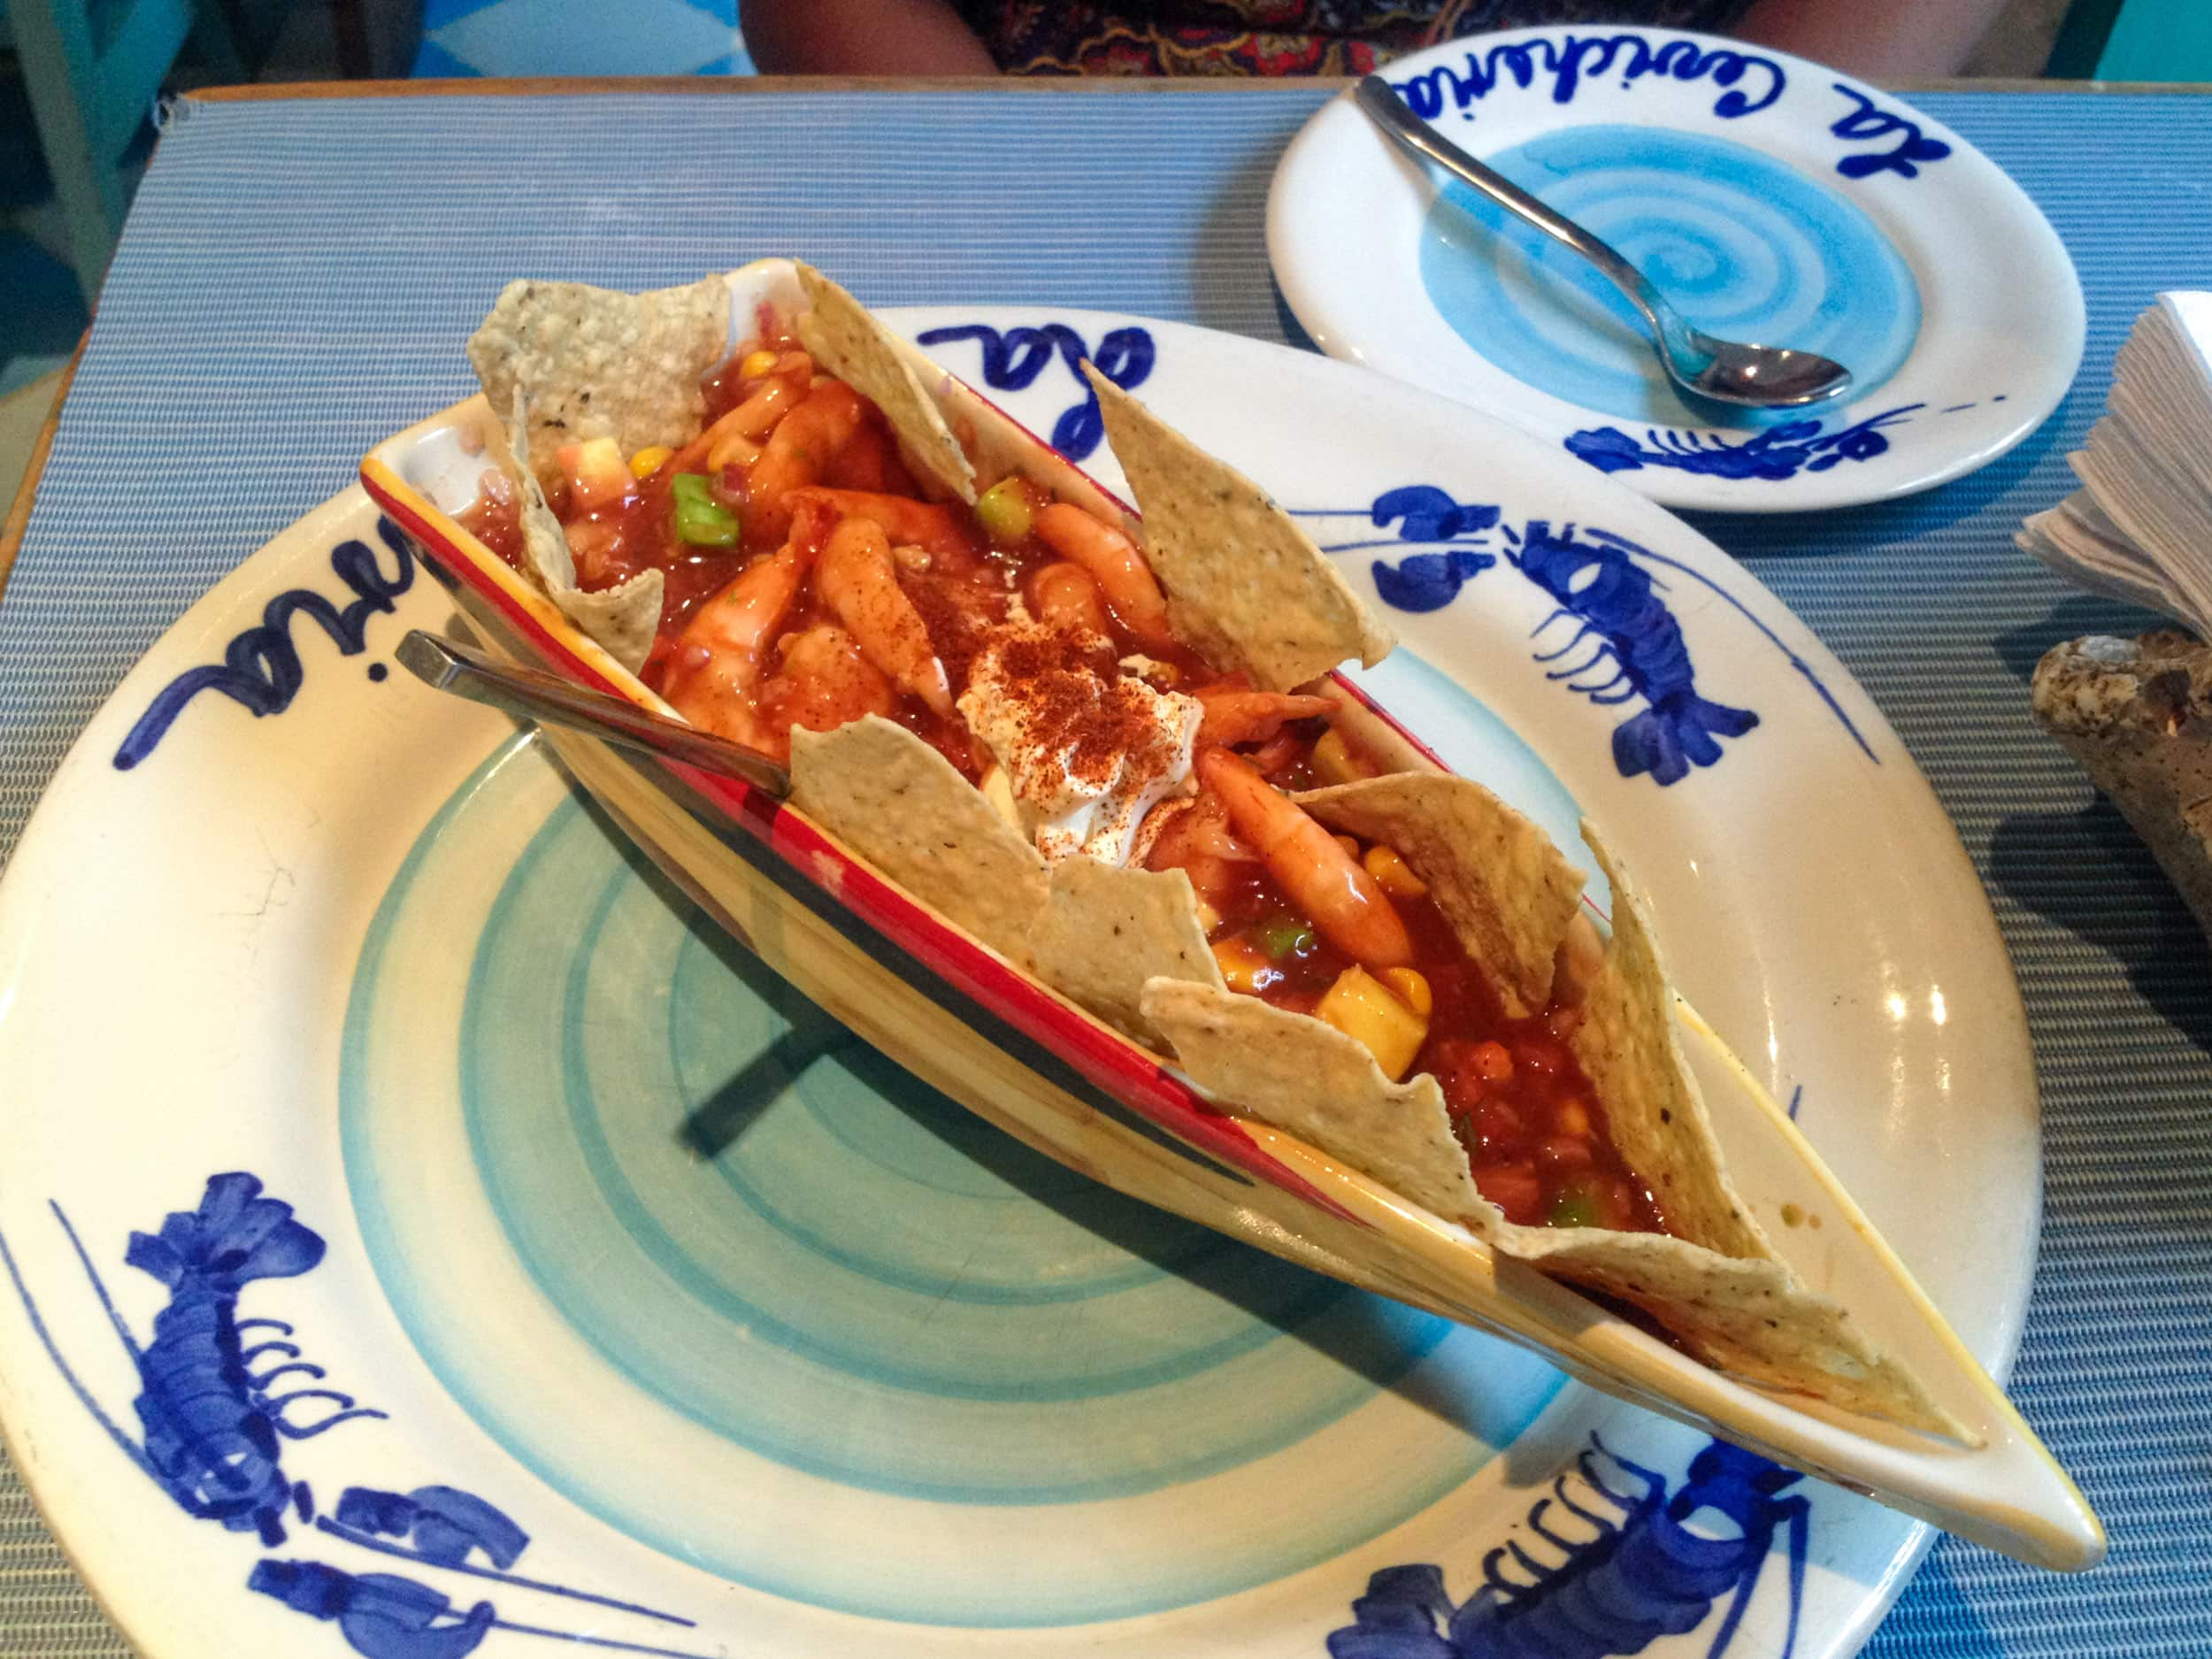 Shrimp ceviche at La Cevicheria, a recommendation in our city guide to Cartagena